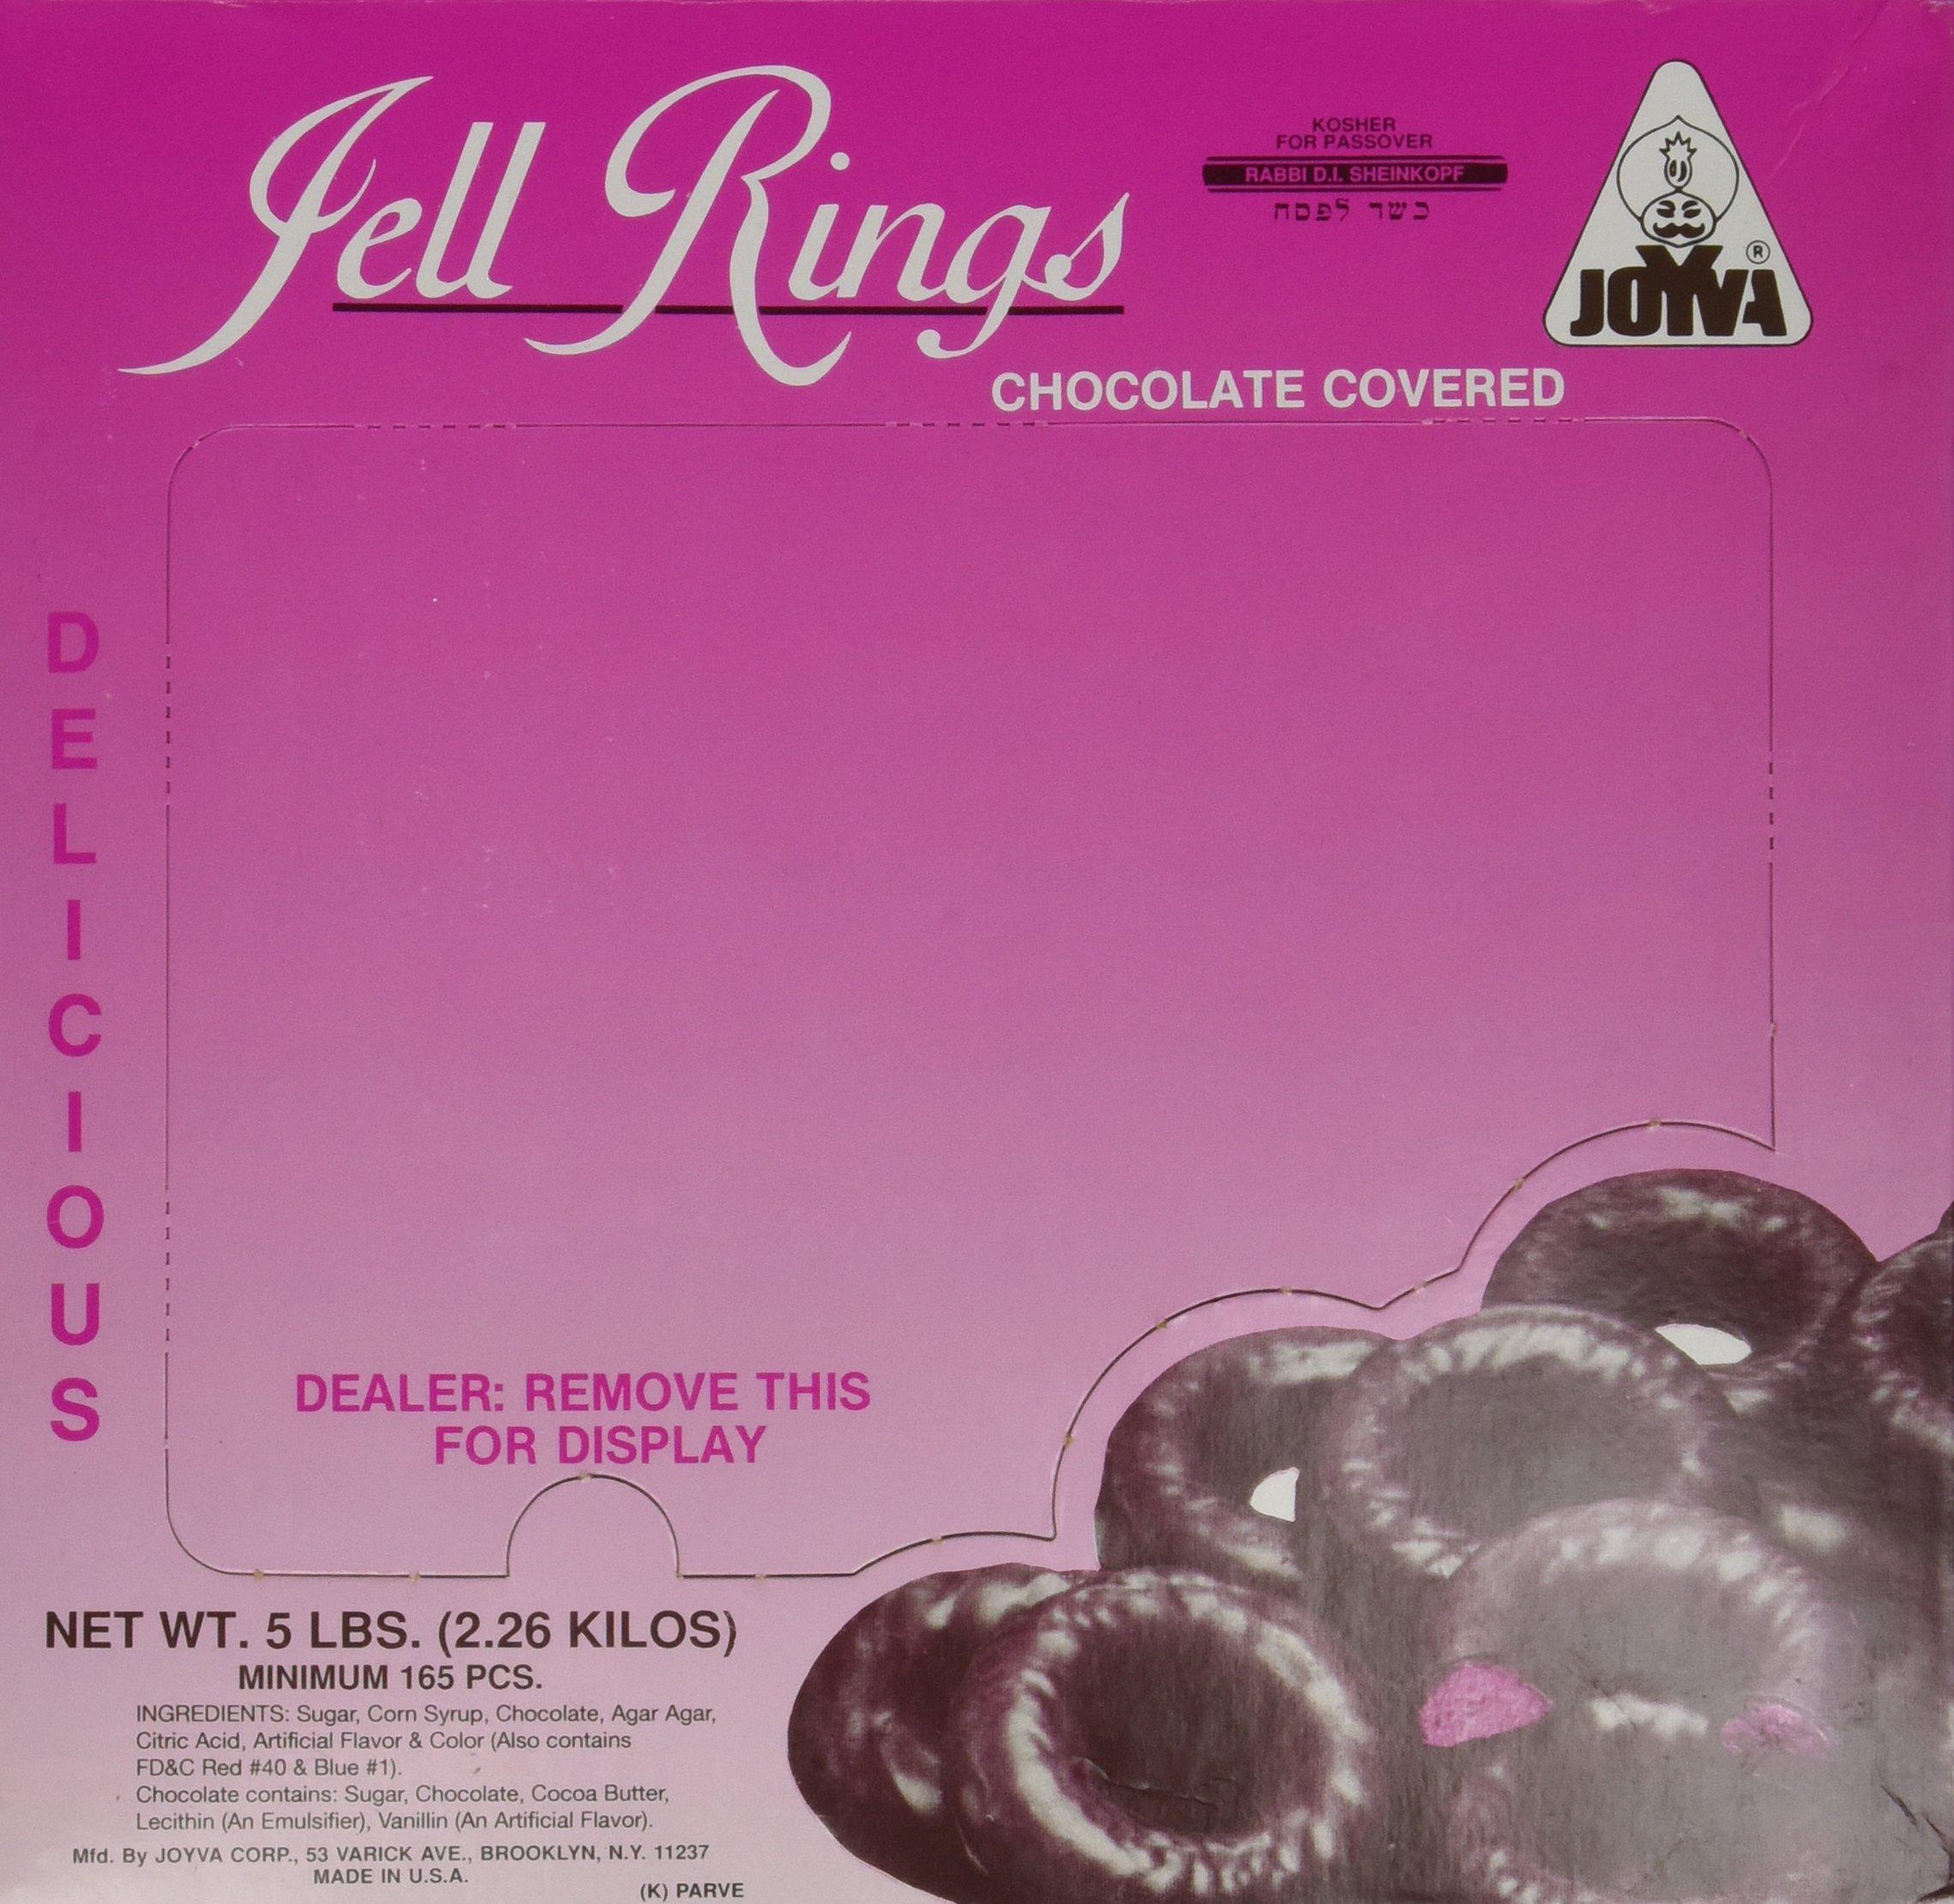 Chocolate Covered Jelly Rings by Joyva 5lbs by Joyva (Image #4)